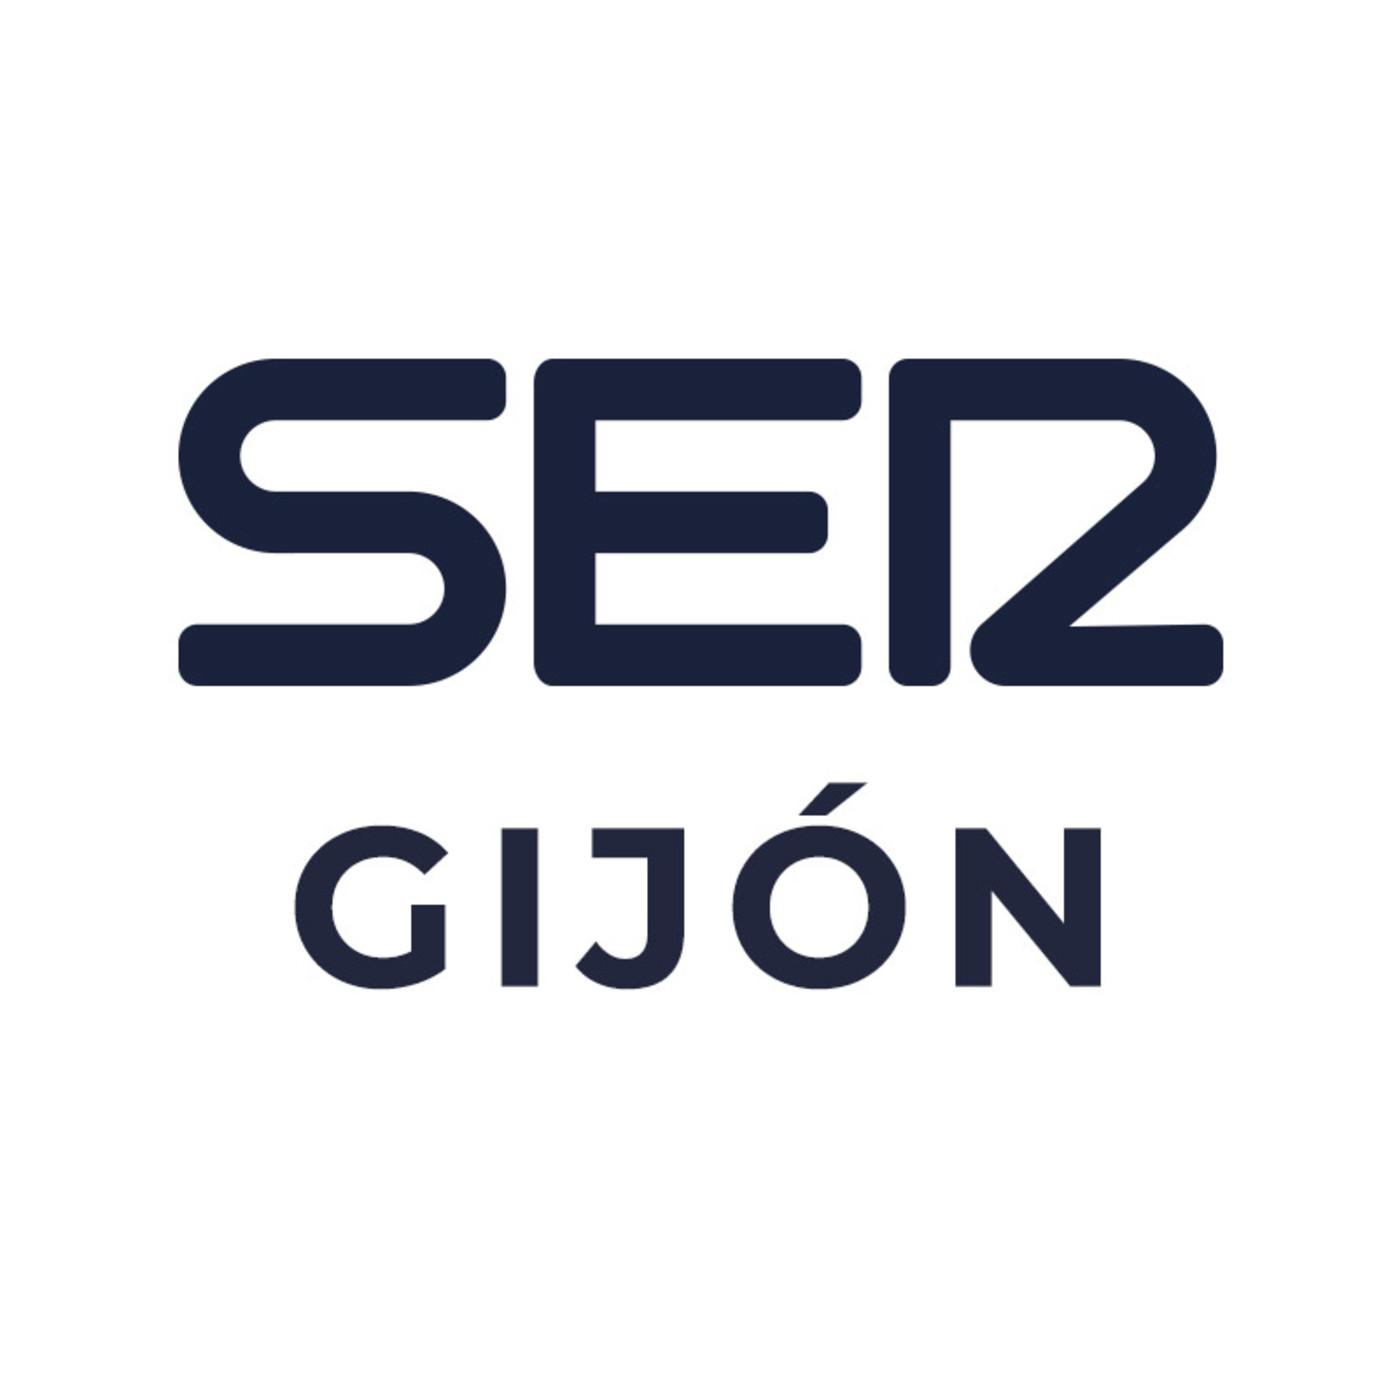 Hoy por Hoy Gijón